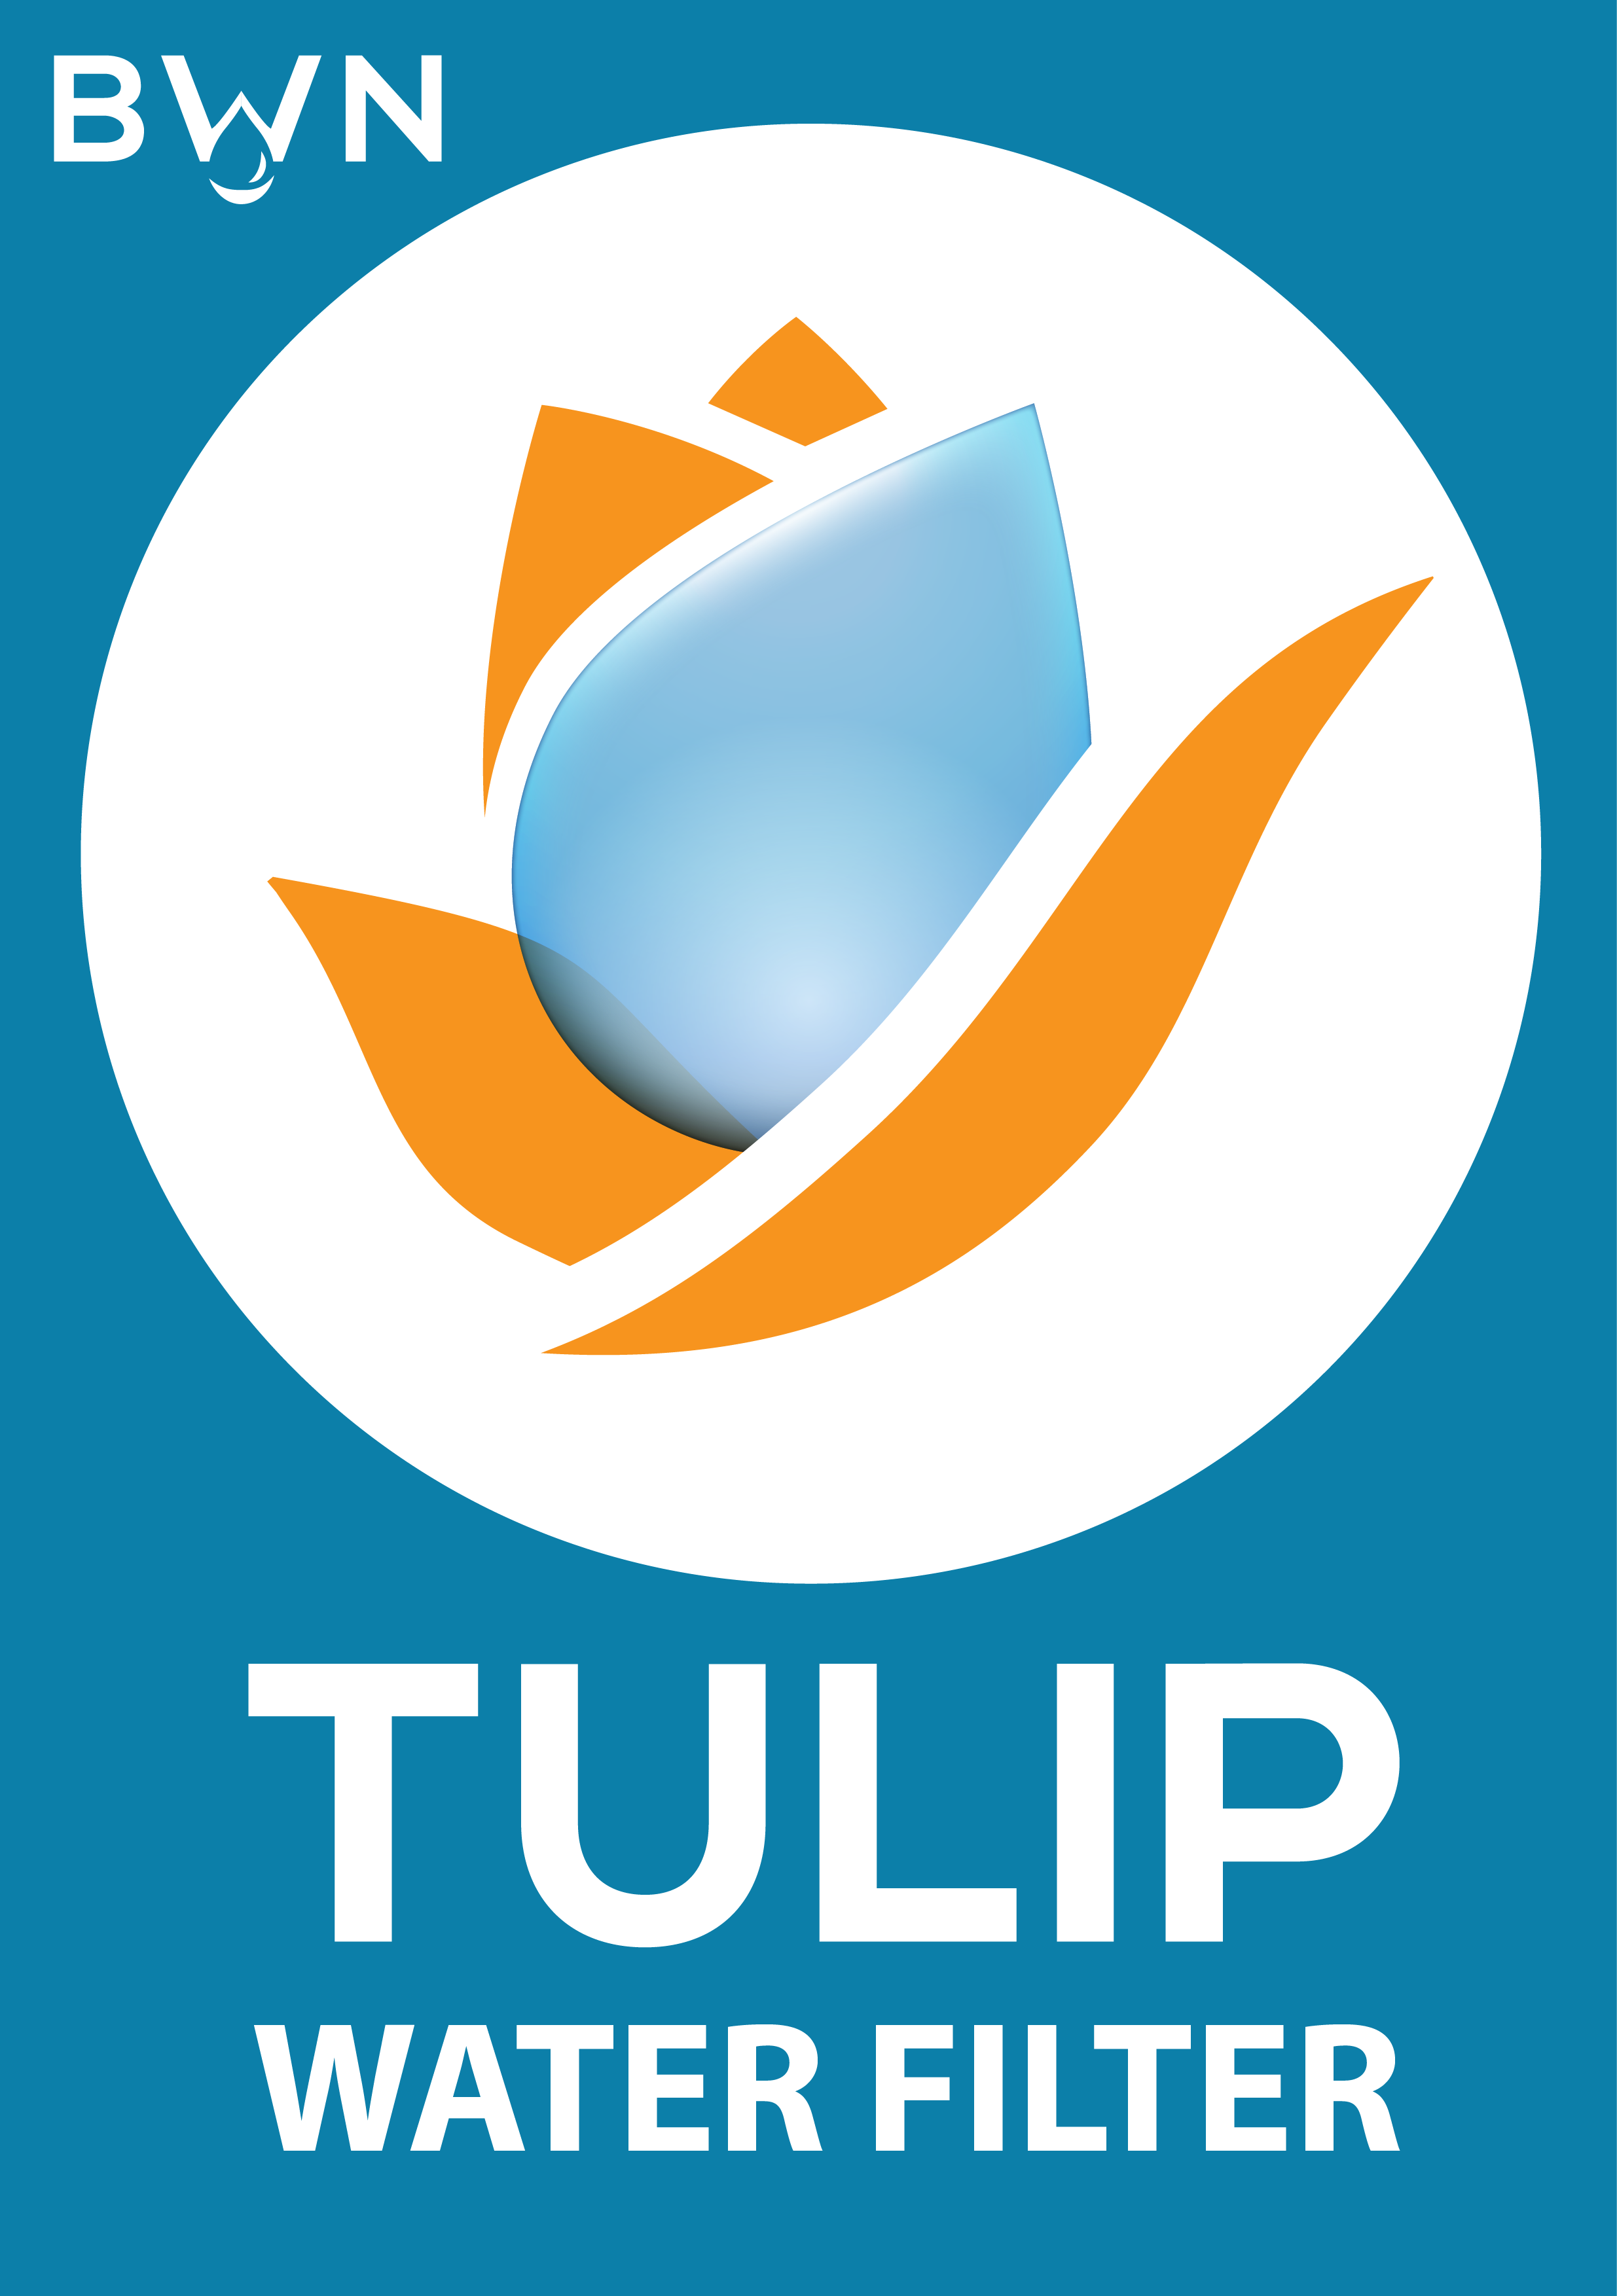 BWN_LOGO_tulip waterfilter